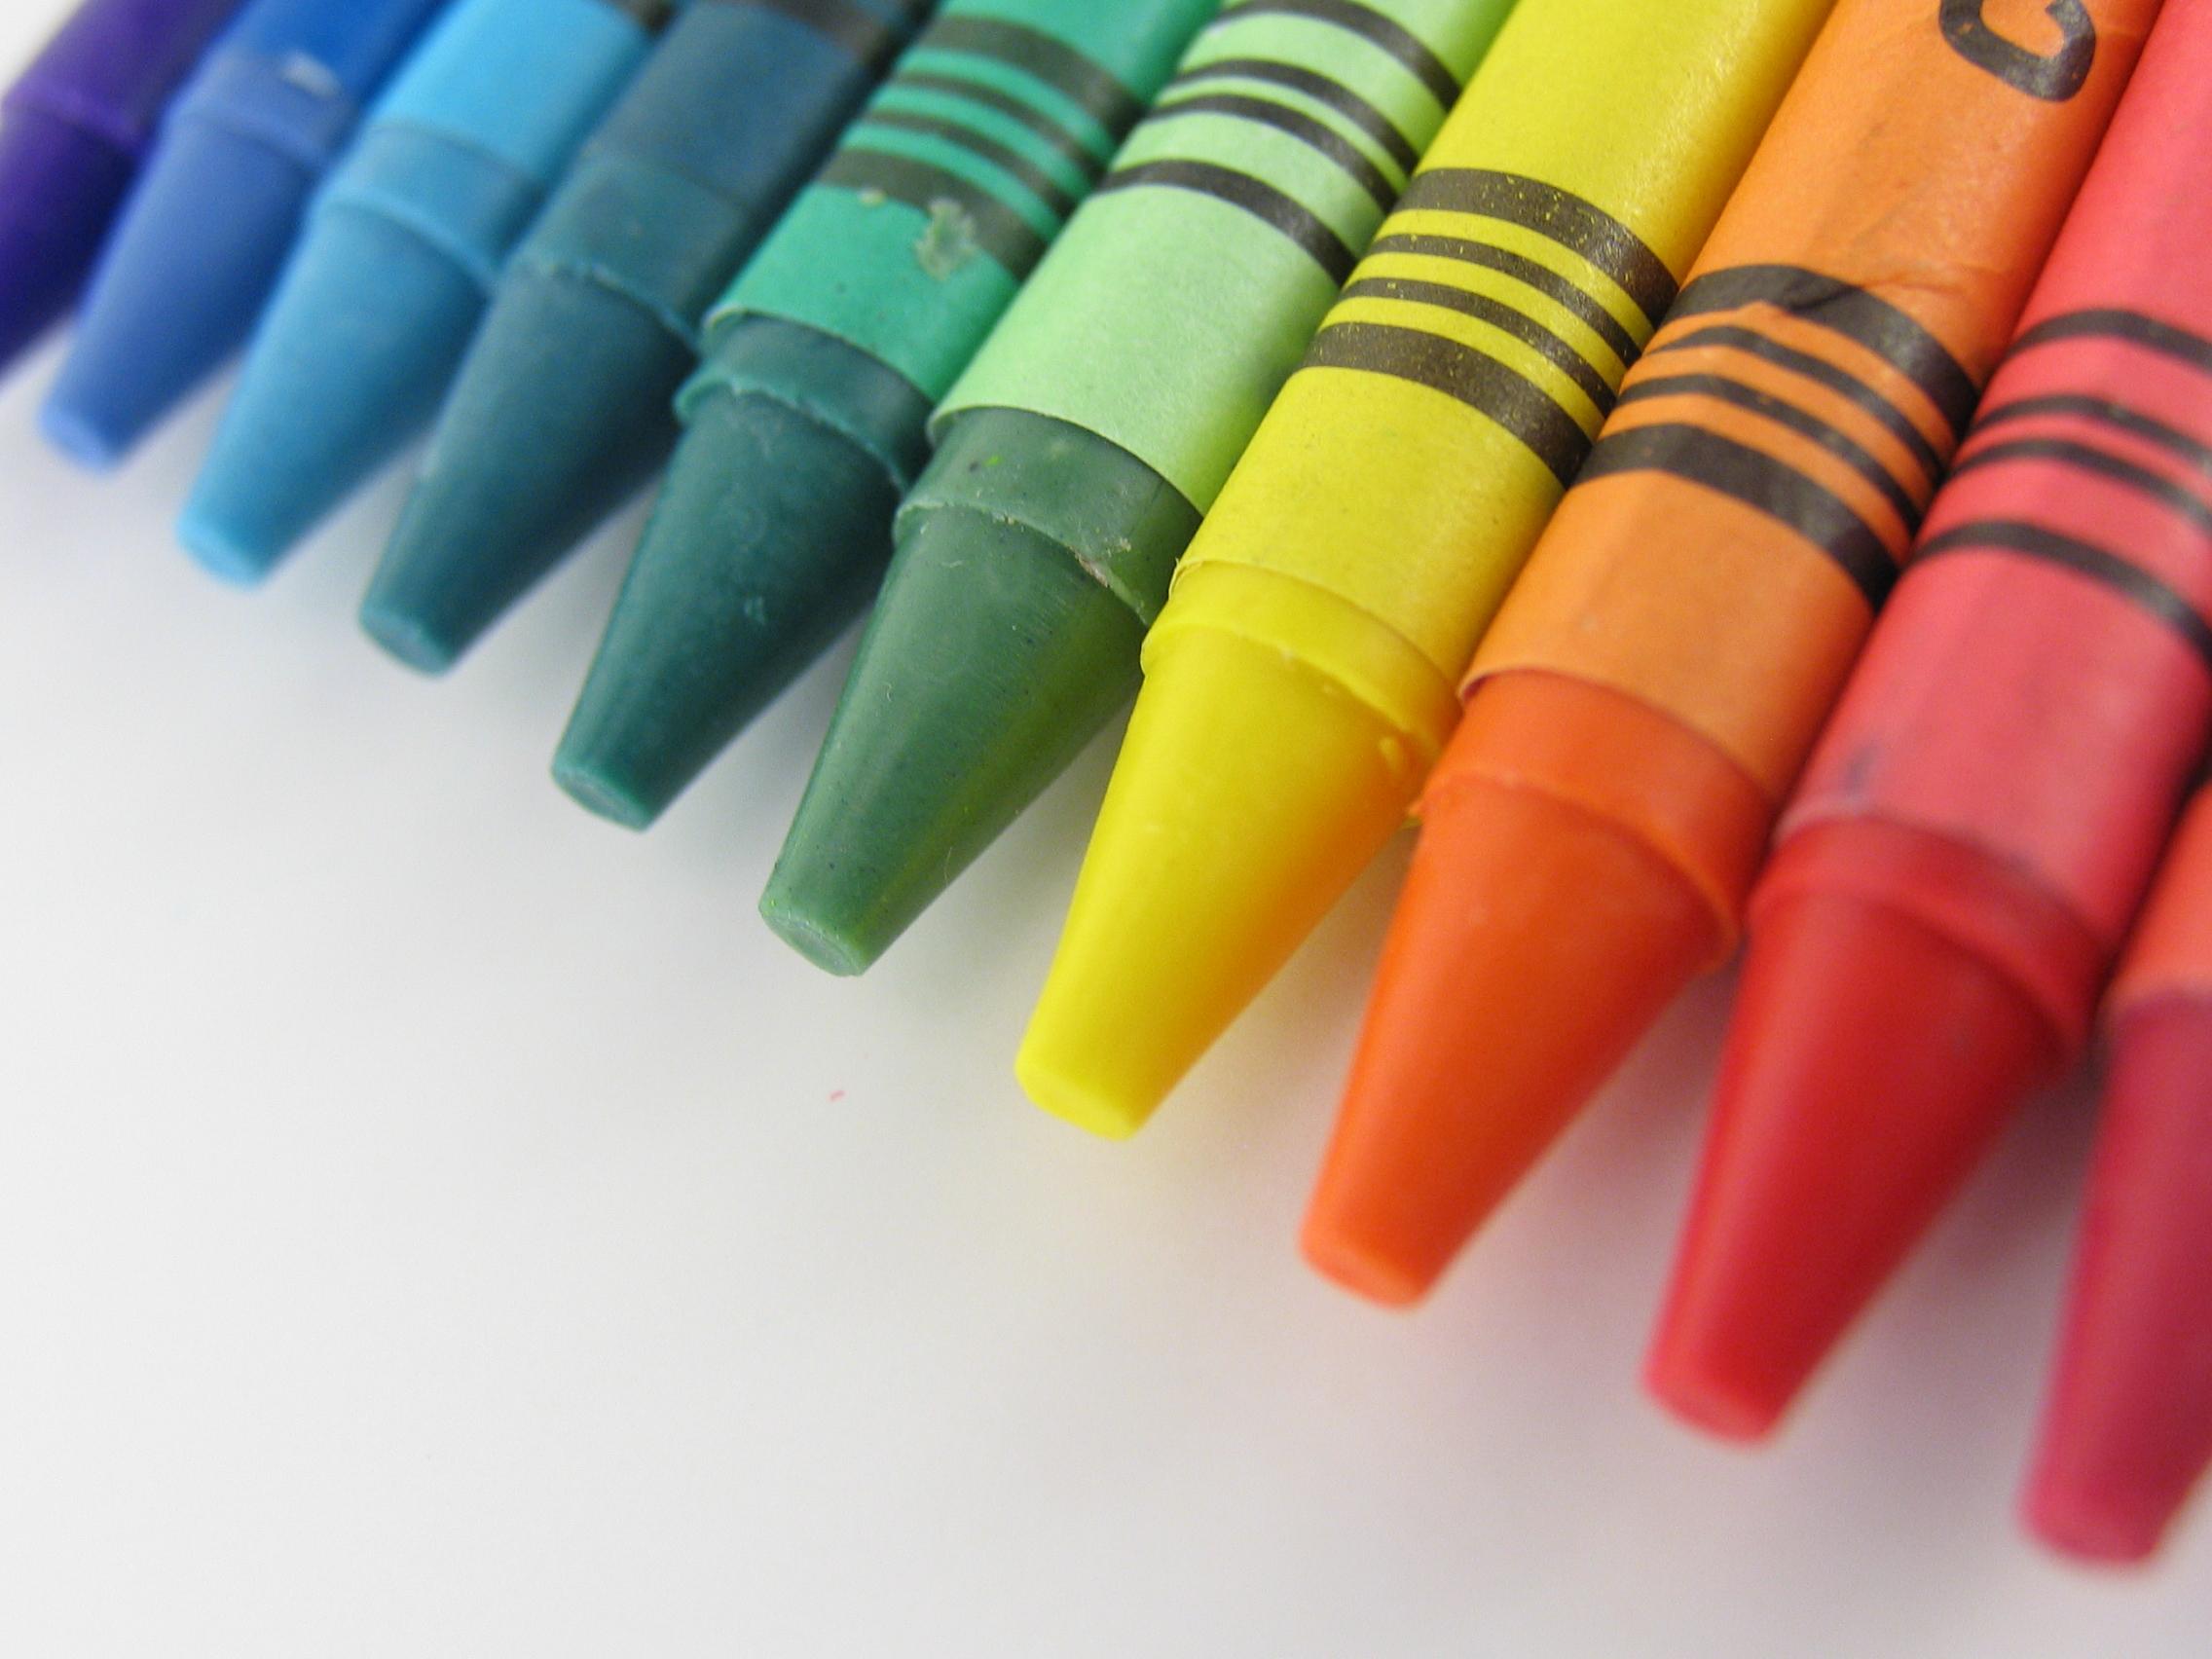 فن بالألوان